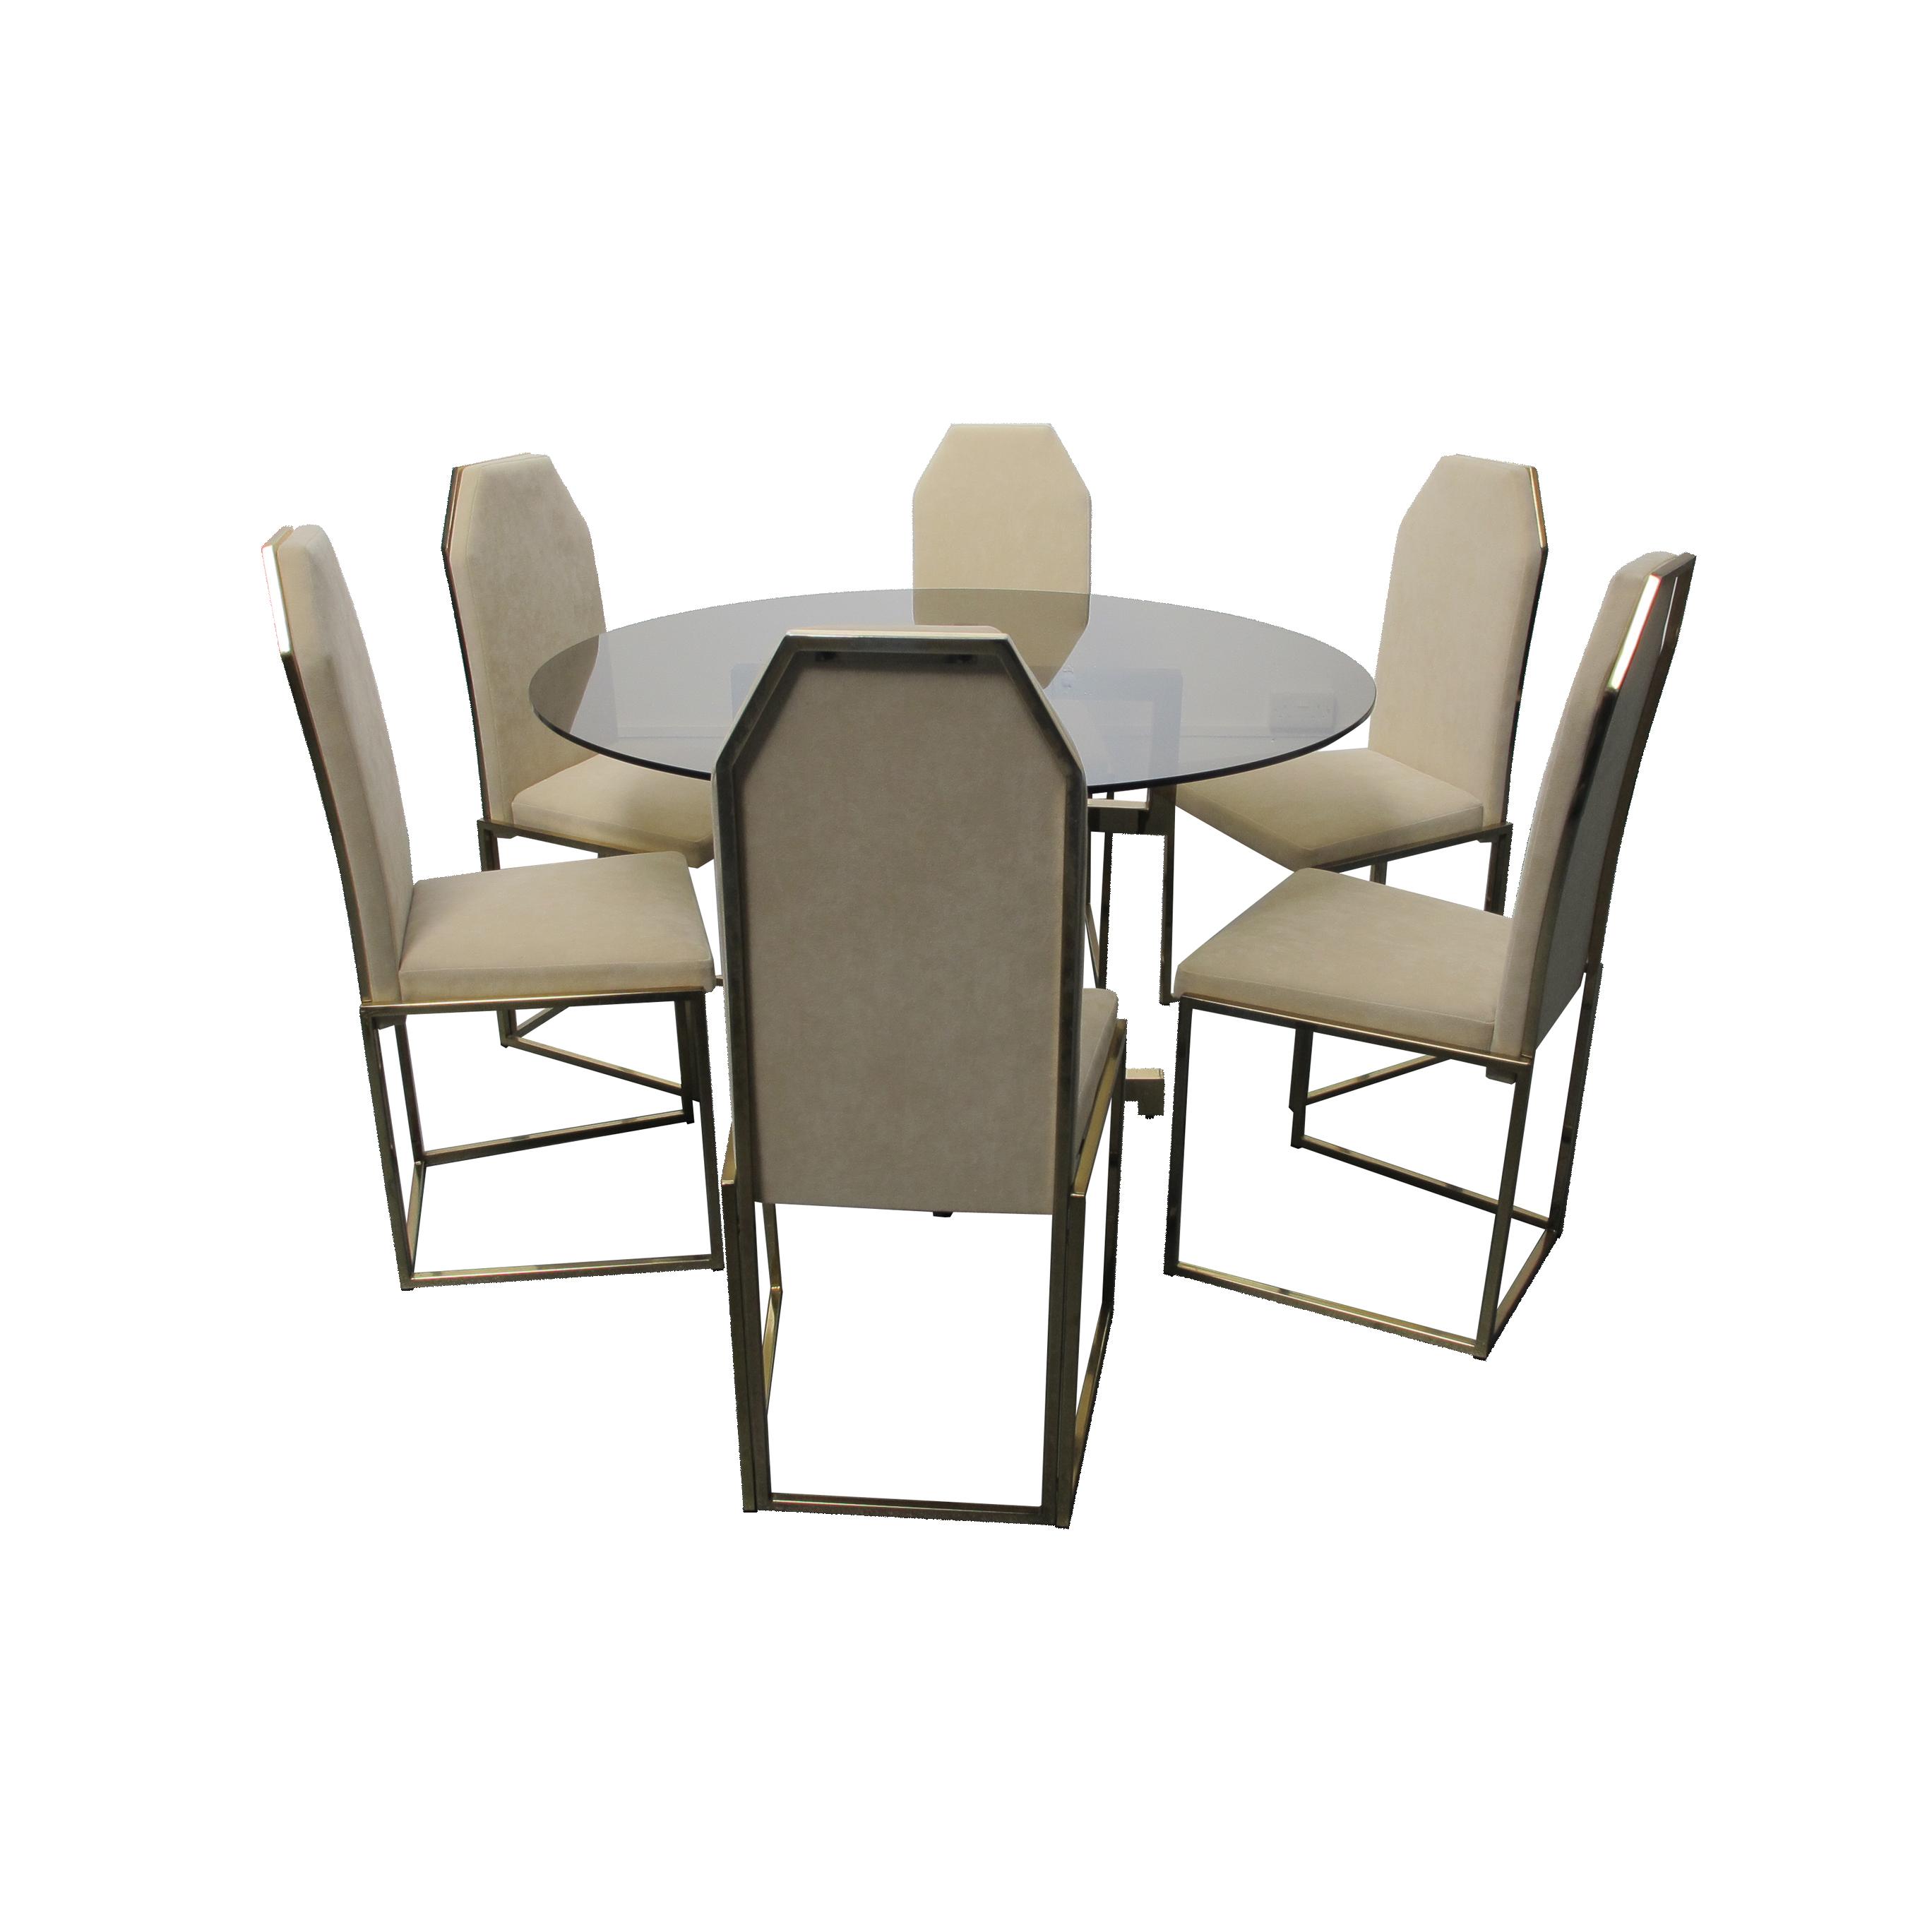 Belgo Chrome Dining Chairs